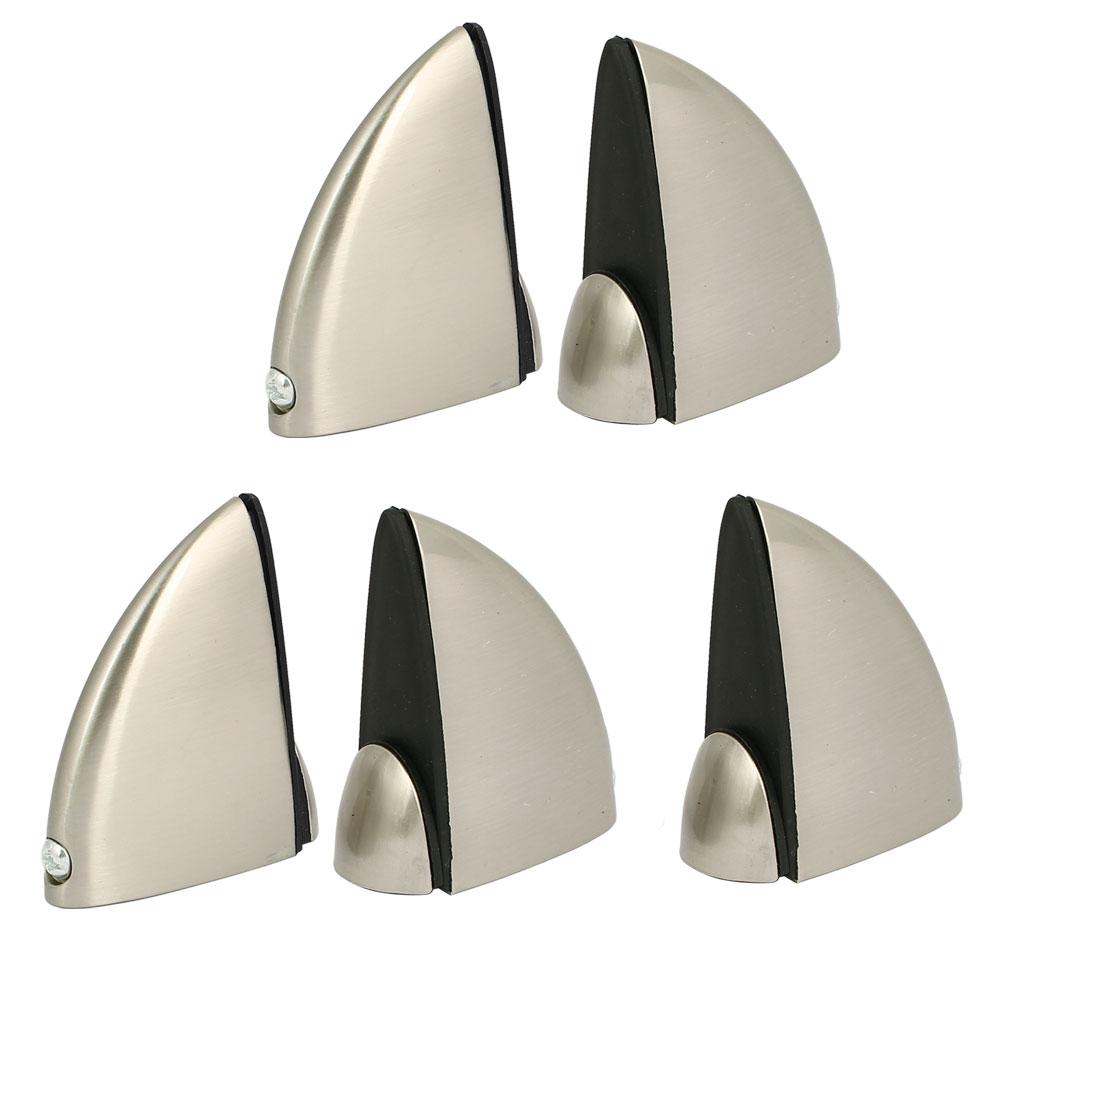 Metal Adjustable Shelf Clip Clamp Holder Bracket 5pcs for 5mm-15mm Thick Glass